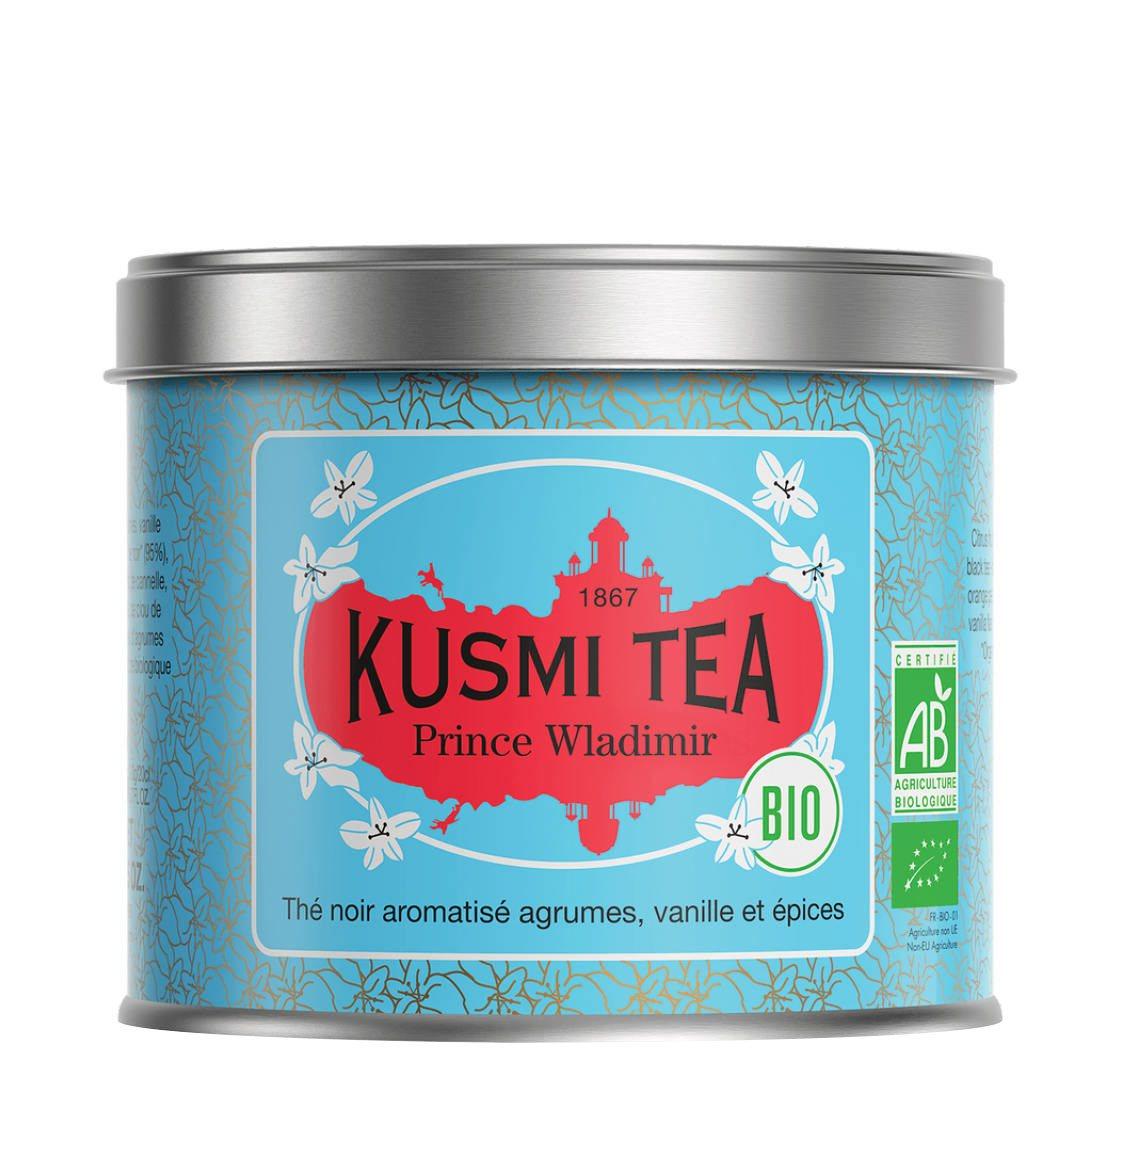 Kusmi Prince Vladimir Organic Loose Tea 100g